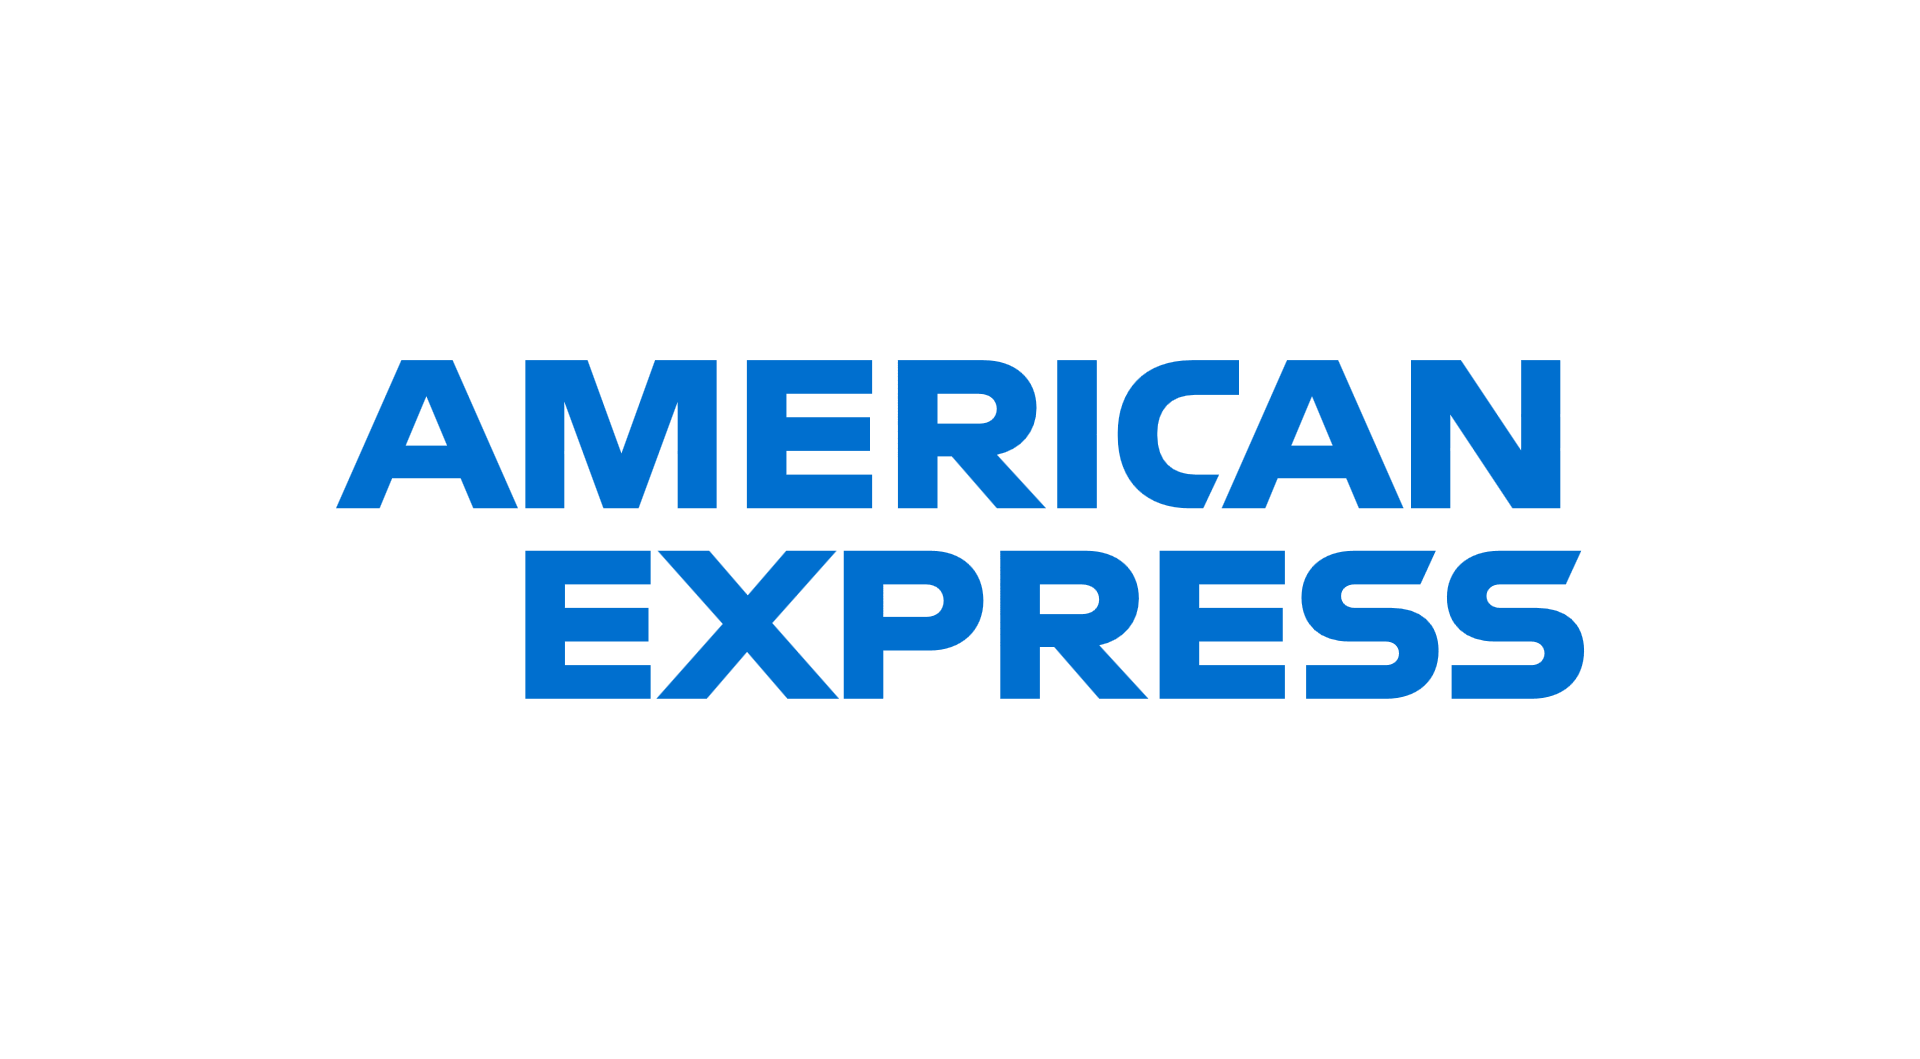 American Express Logotype Stacked